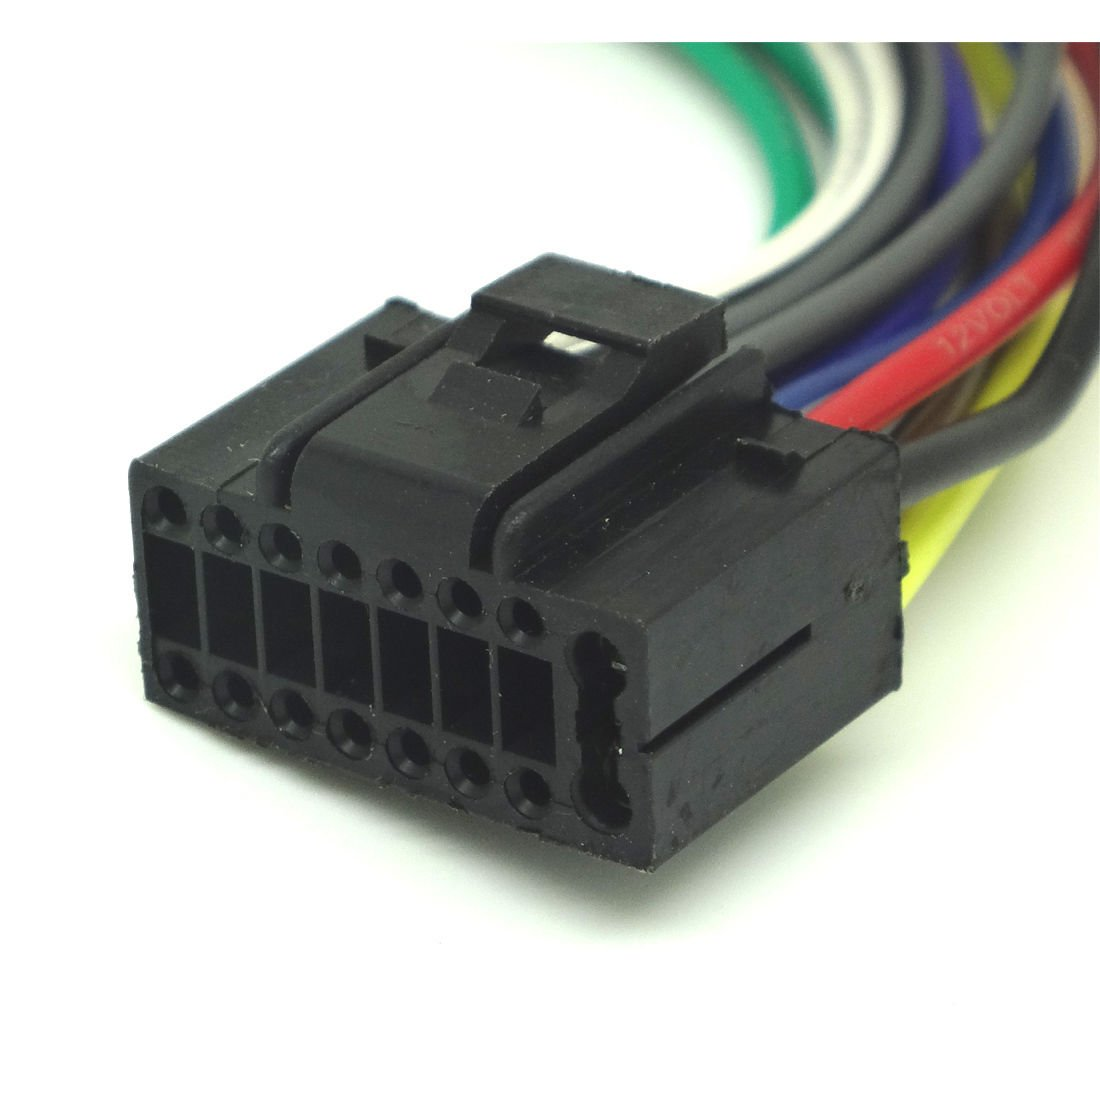 Kenwood Kdc 258u Wiring Harness Diagrams Stereo Diagram Amazon Com Conpus 16 Pin Radio Car Audio Wire For Rh